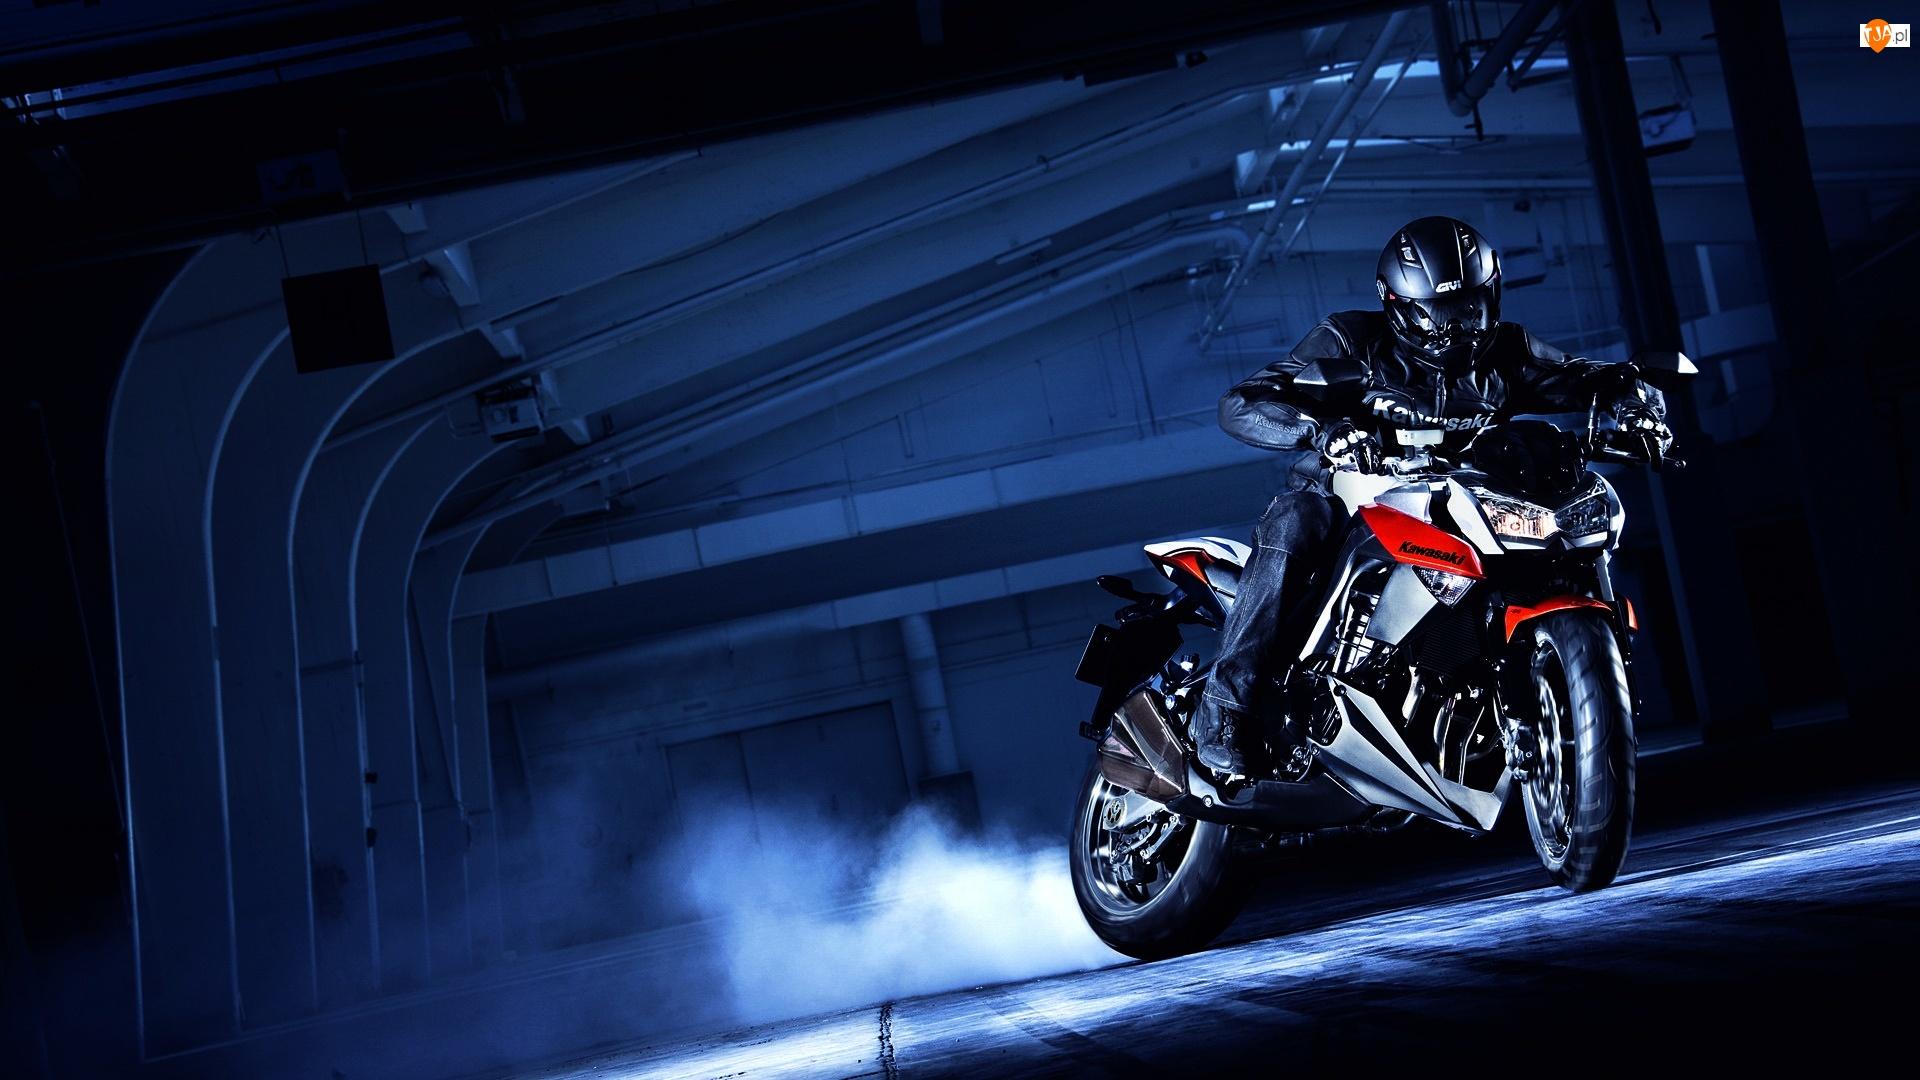 Kawasaki, Tunel, Motocyklista